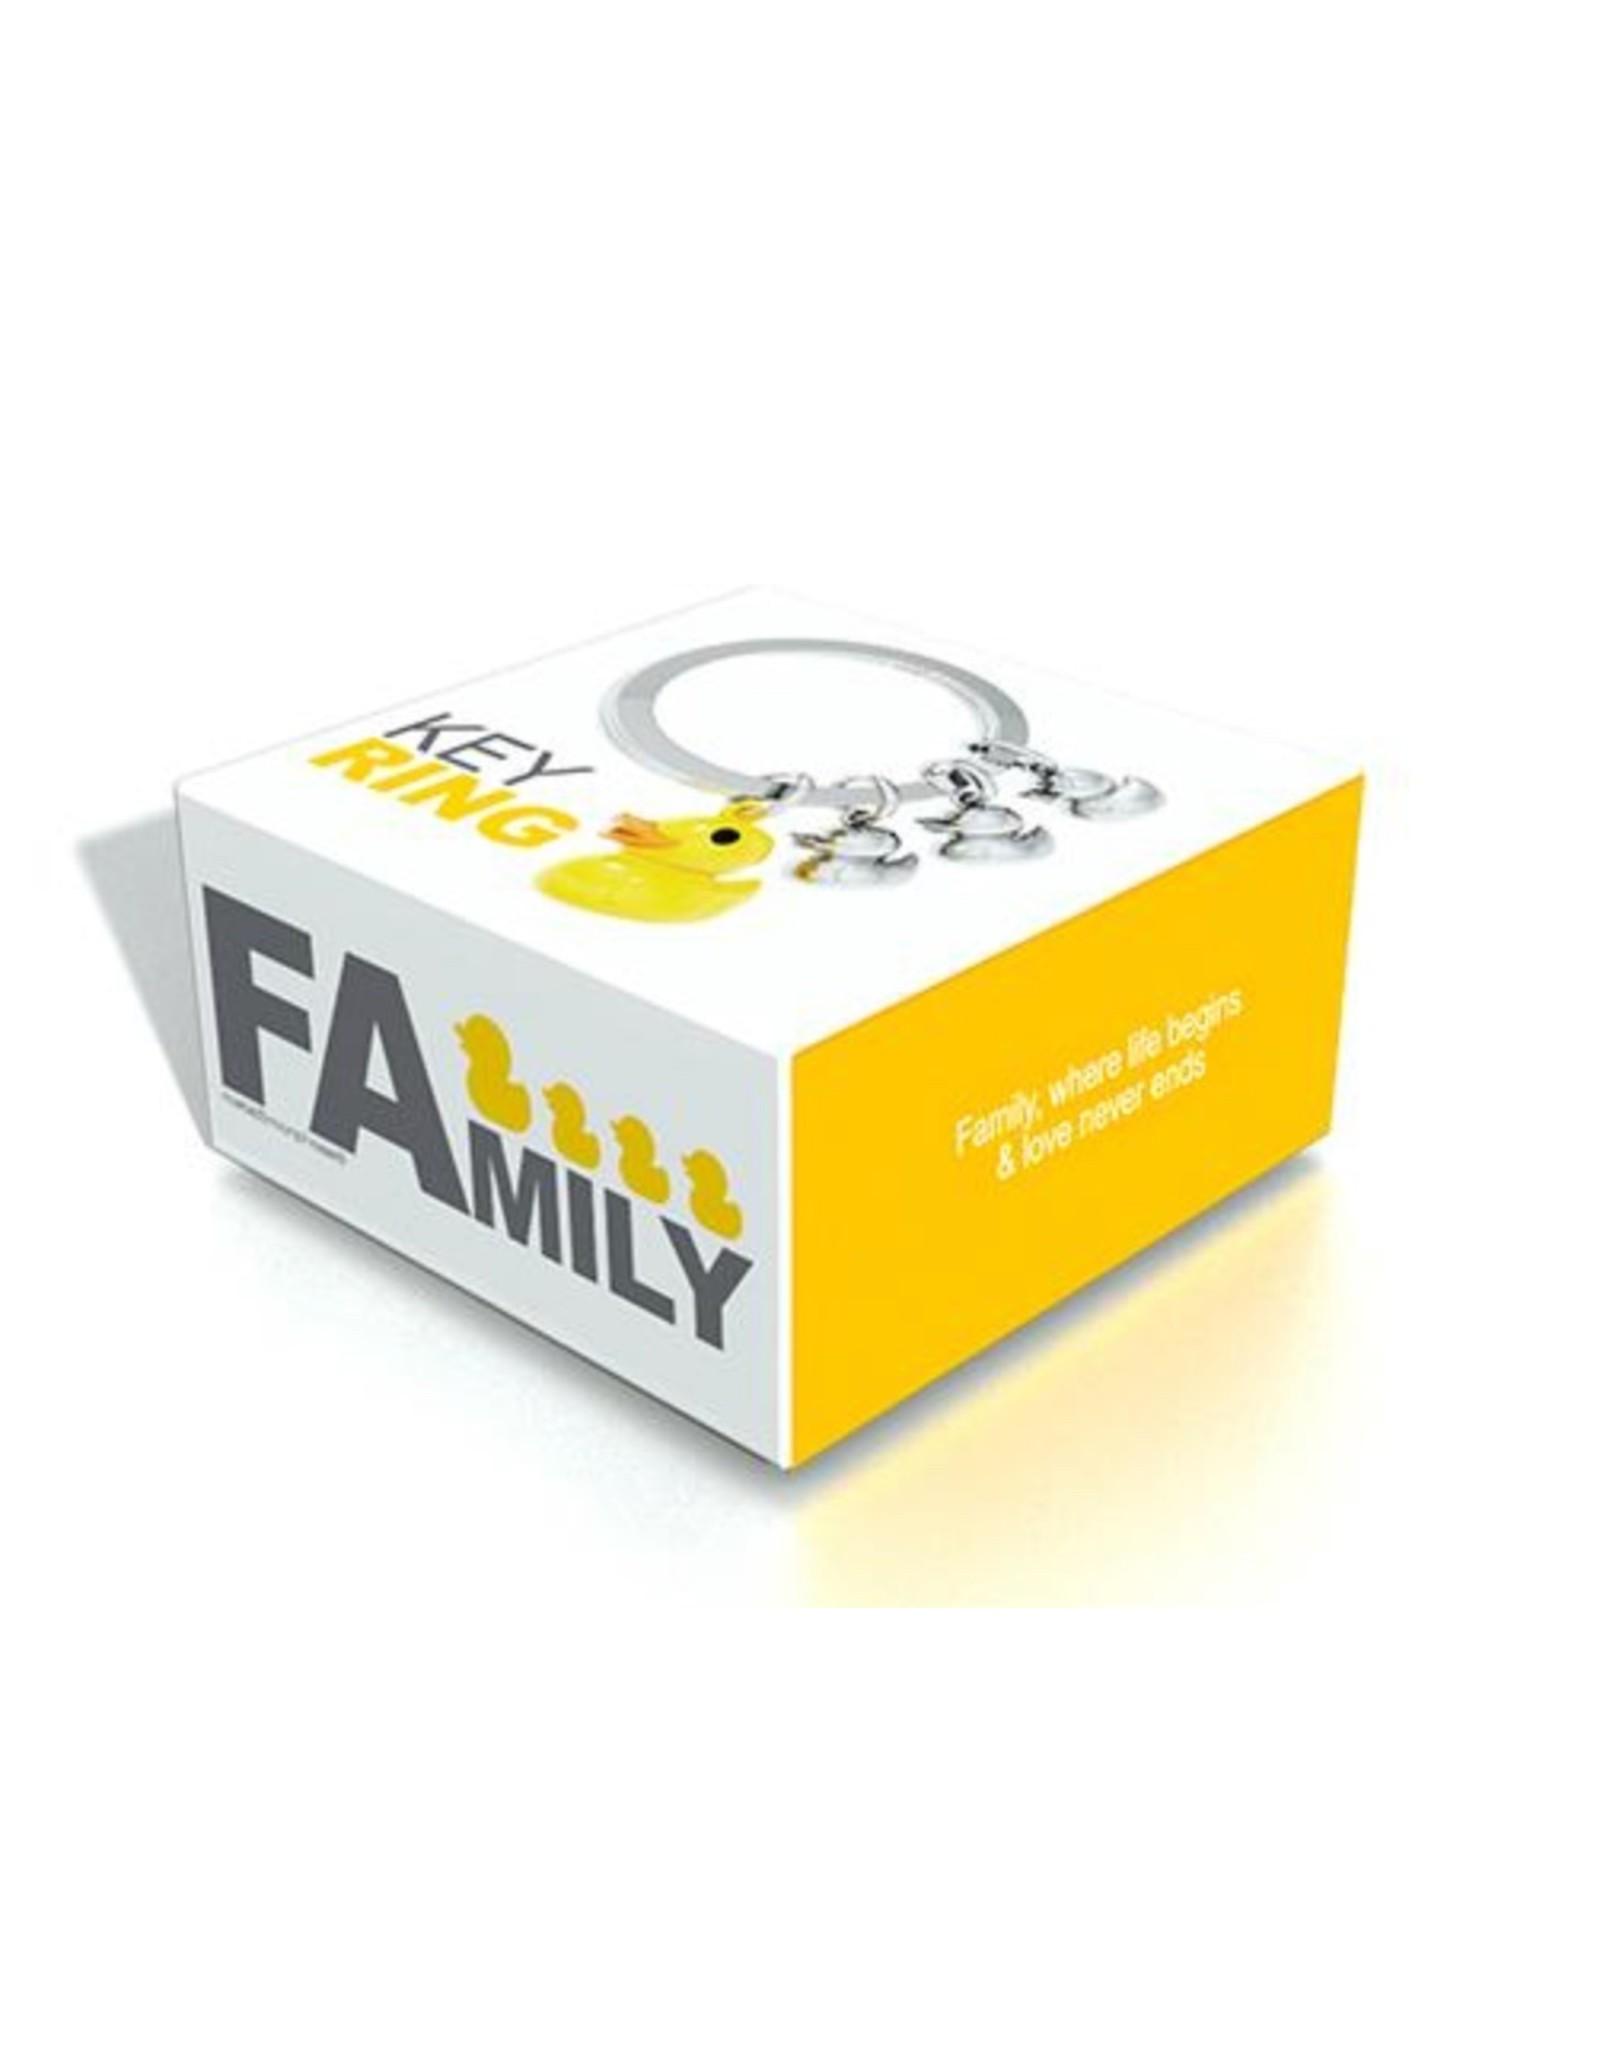 Rubber Duck Family Key Ring